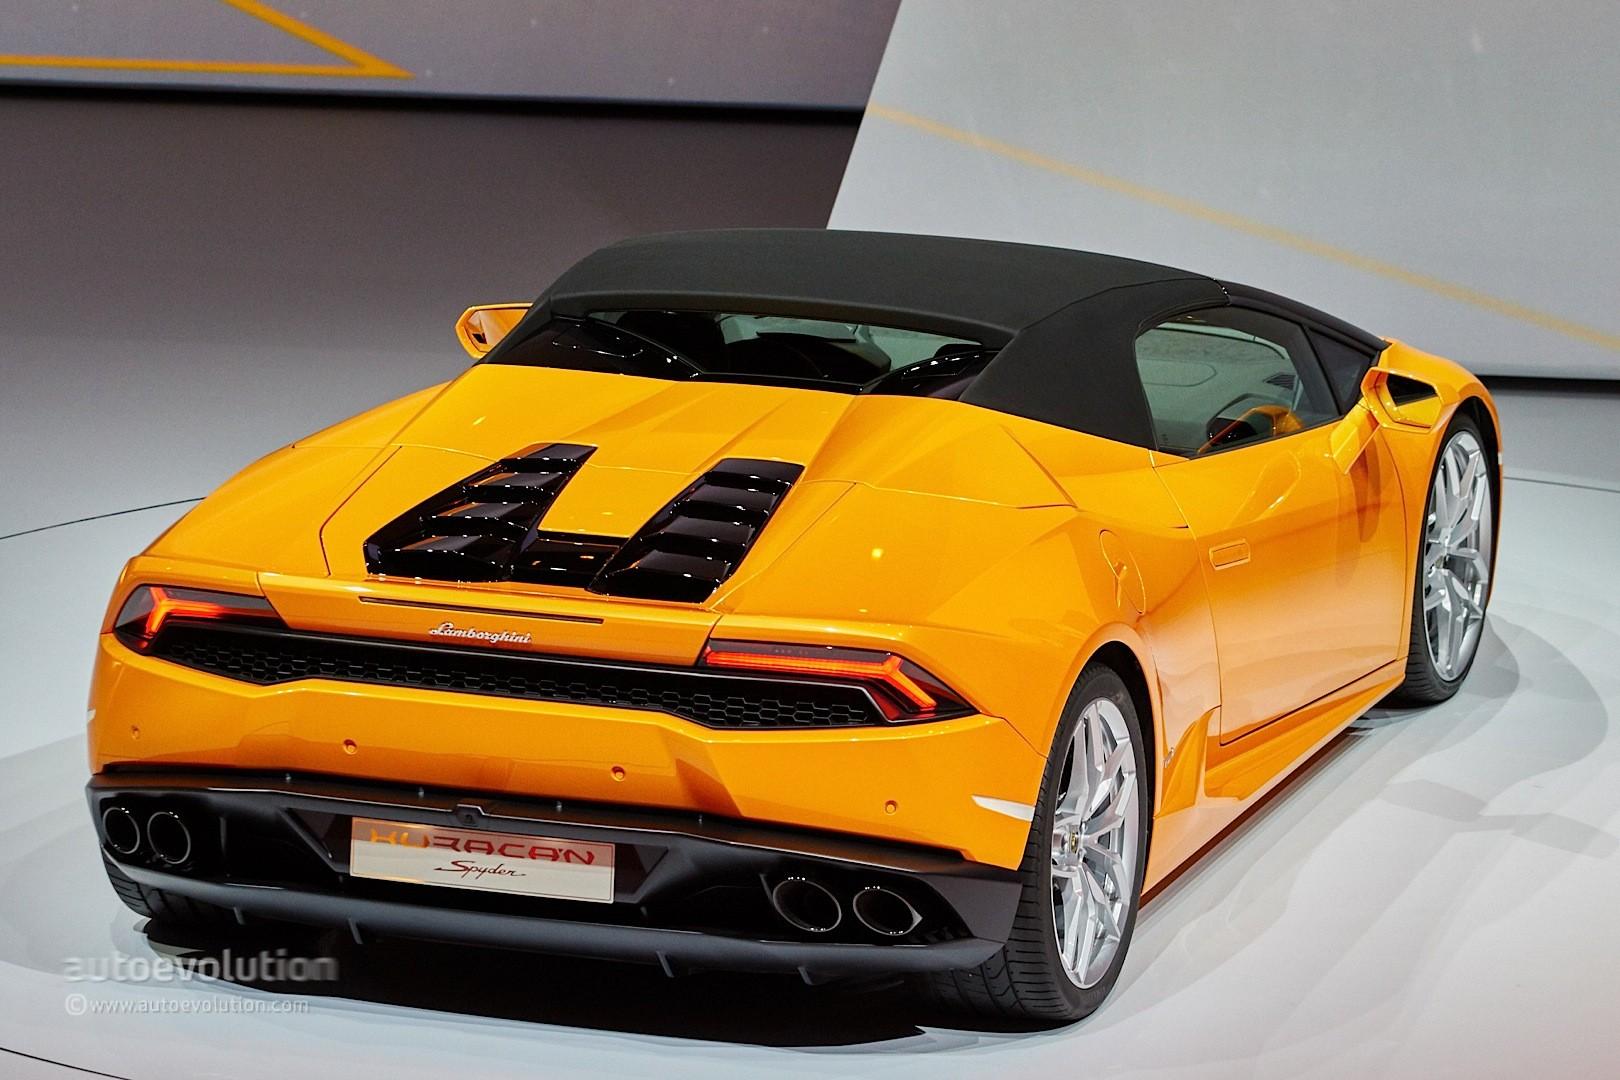 Lamborghini Huracan Spyder Looks Like the Ferrari 488\u0027s Arch